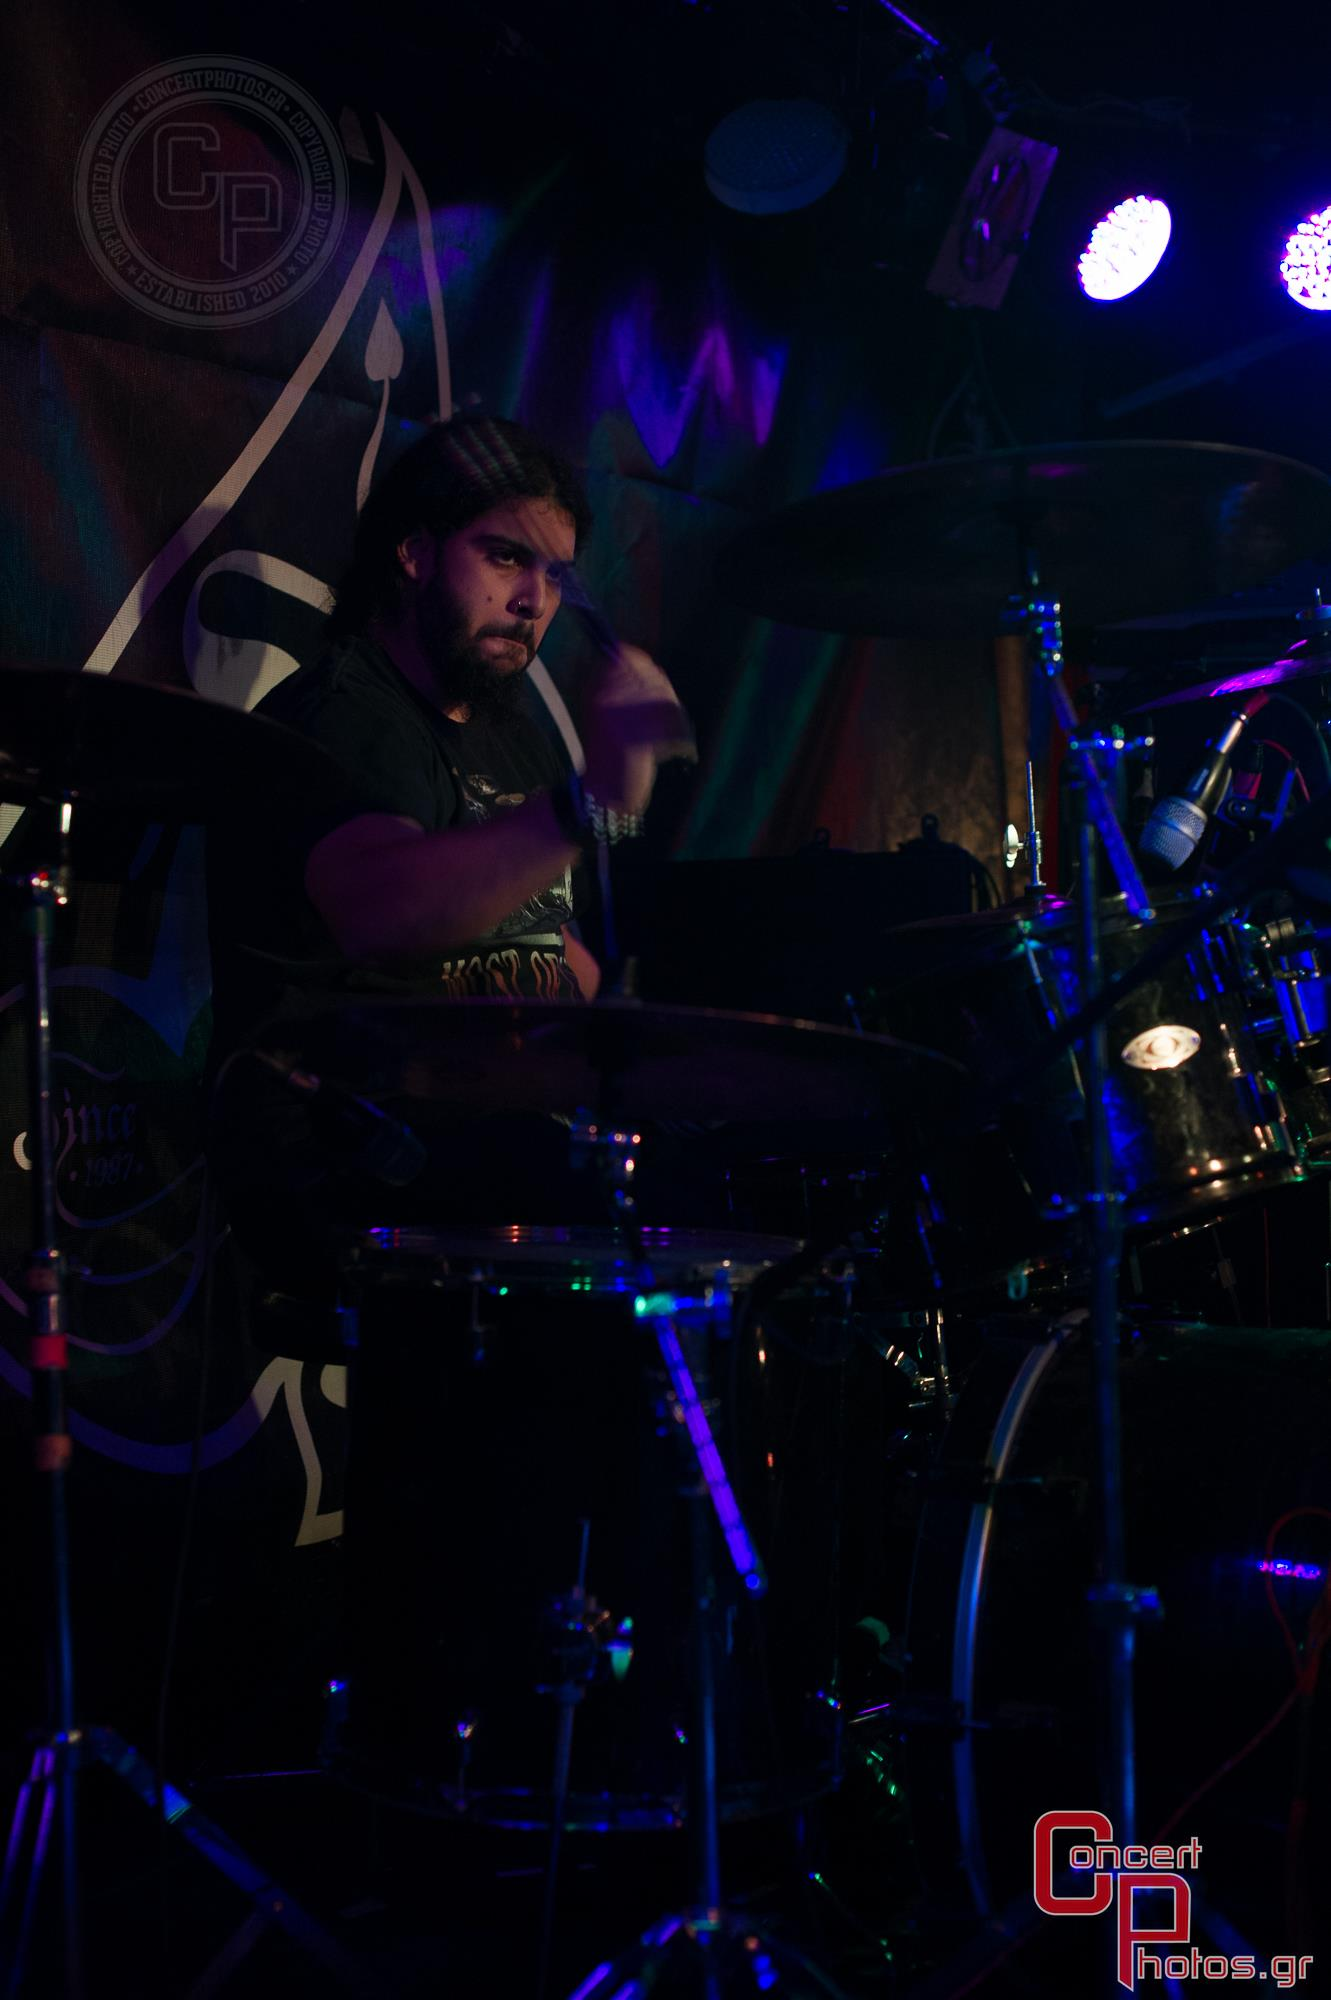 Battle Of The Bands Athens - Leg 3- photographer:  - ConcertPhotos - 20150105_0006_55